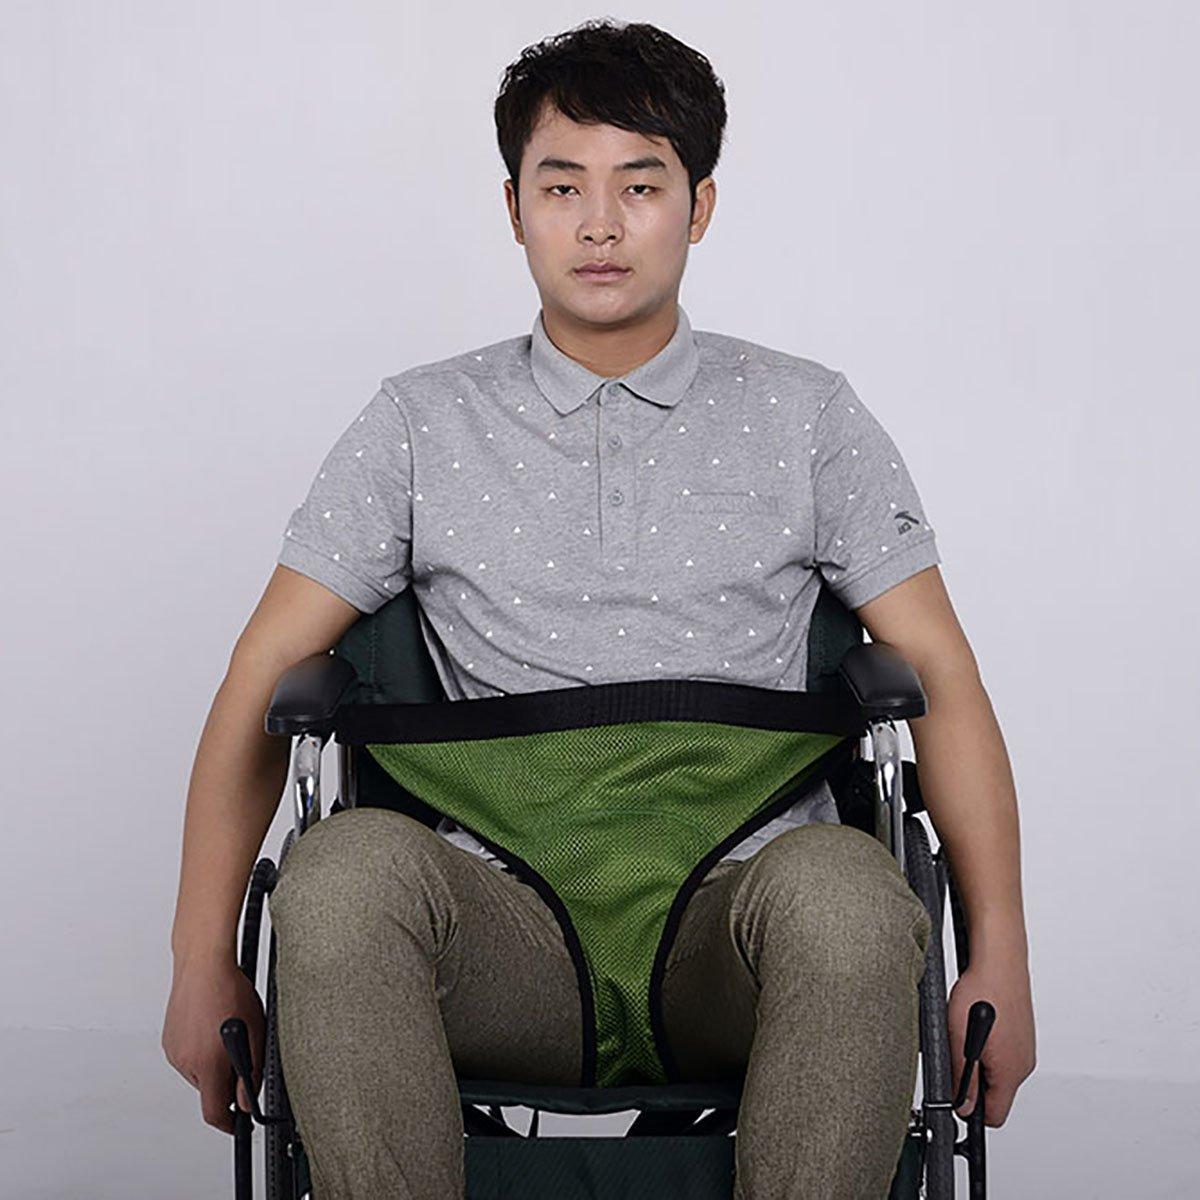 Chenhon Soft Cushion Belt, for Wheelchair Or Bed (Reticular)